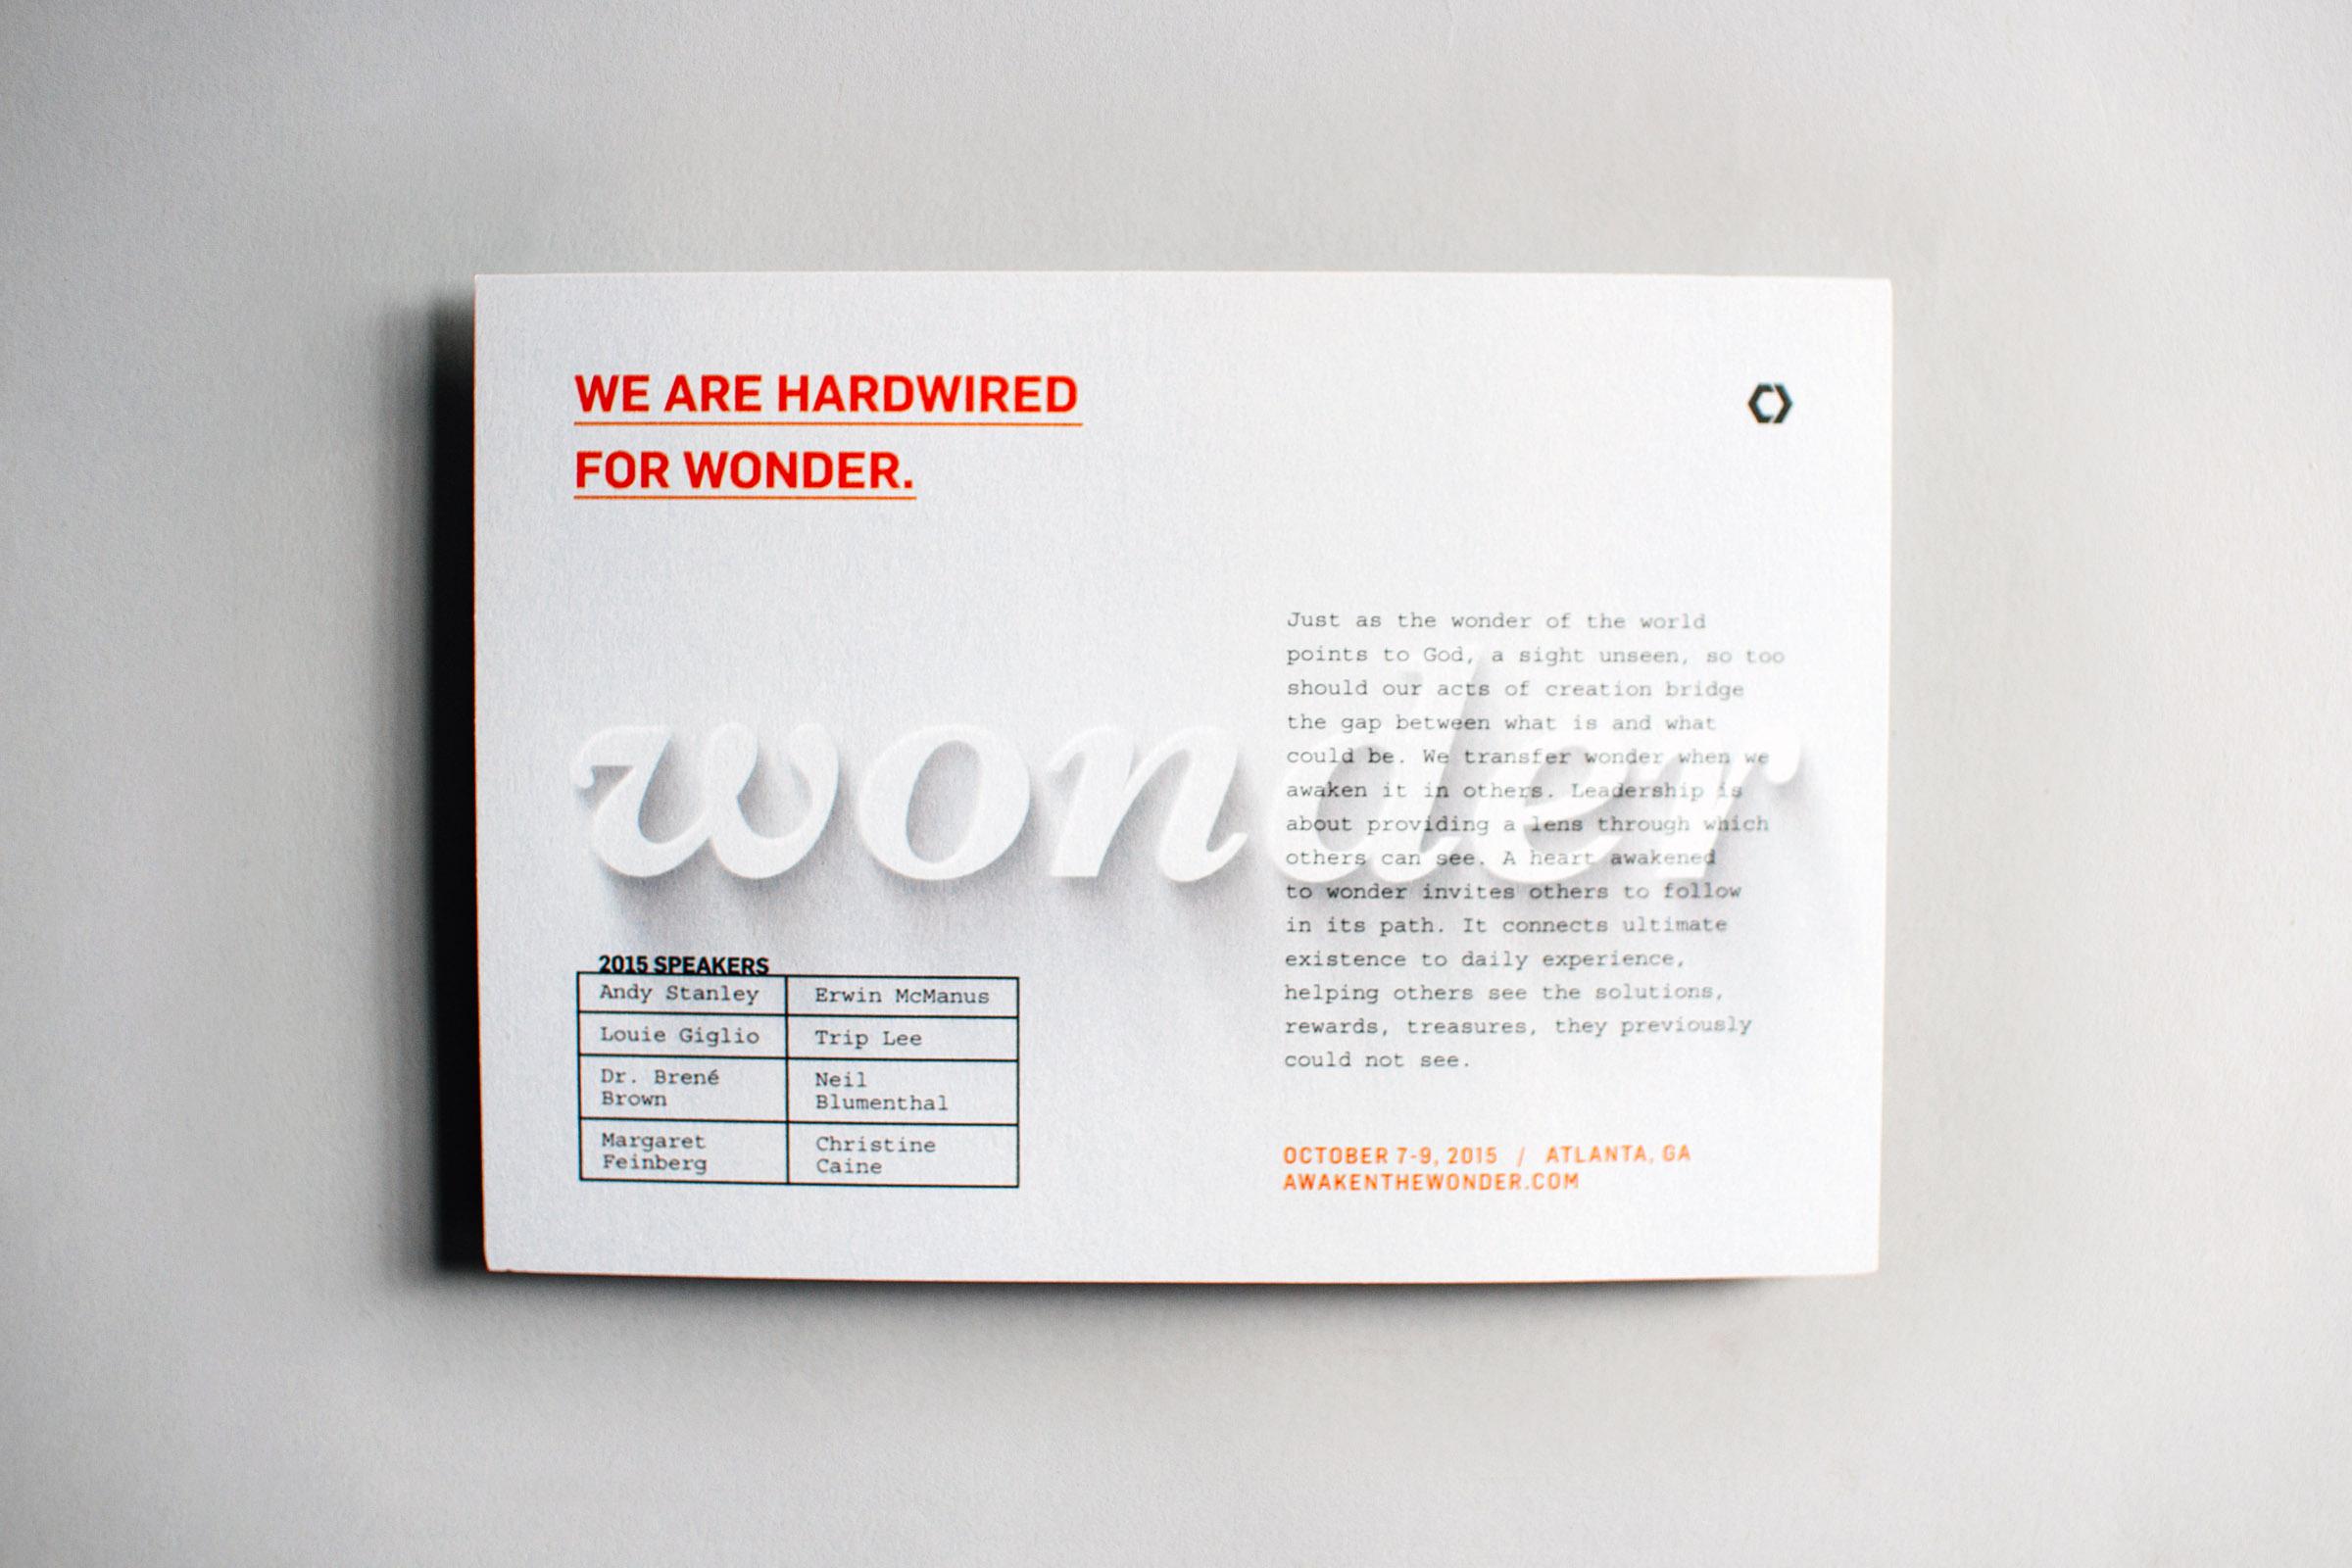 We are hardwired for wonder postcard graphic design for Catalyst Conference Awaken the Wonder branding.